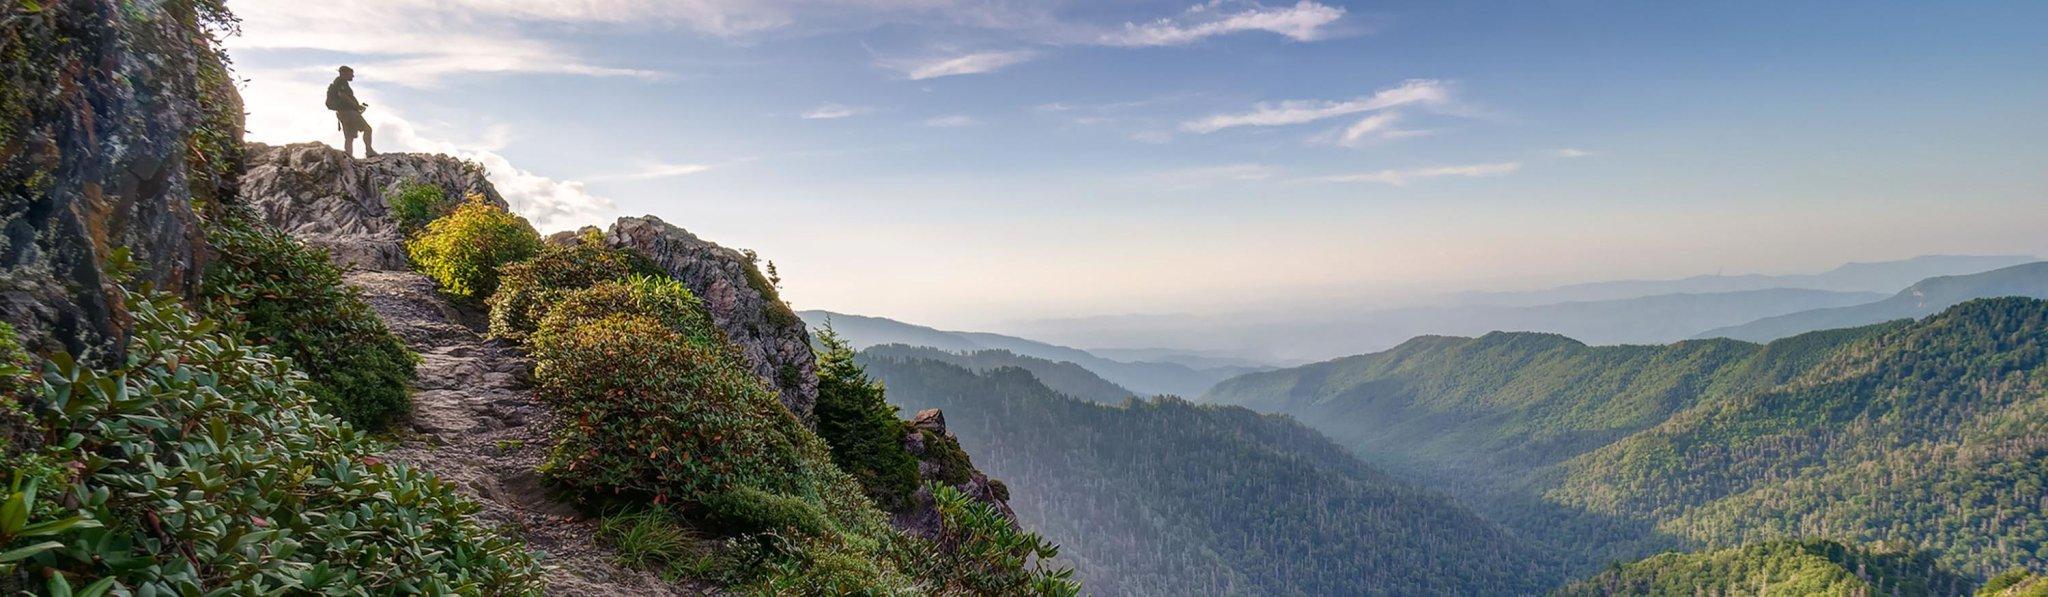 Great Smoky Mountains National Park (U.S. National Park Service)